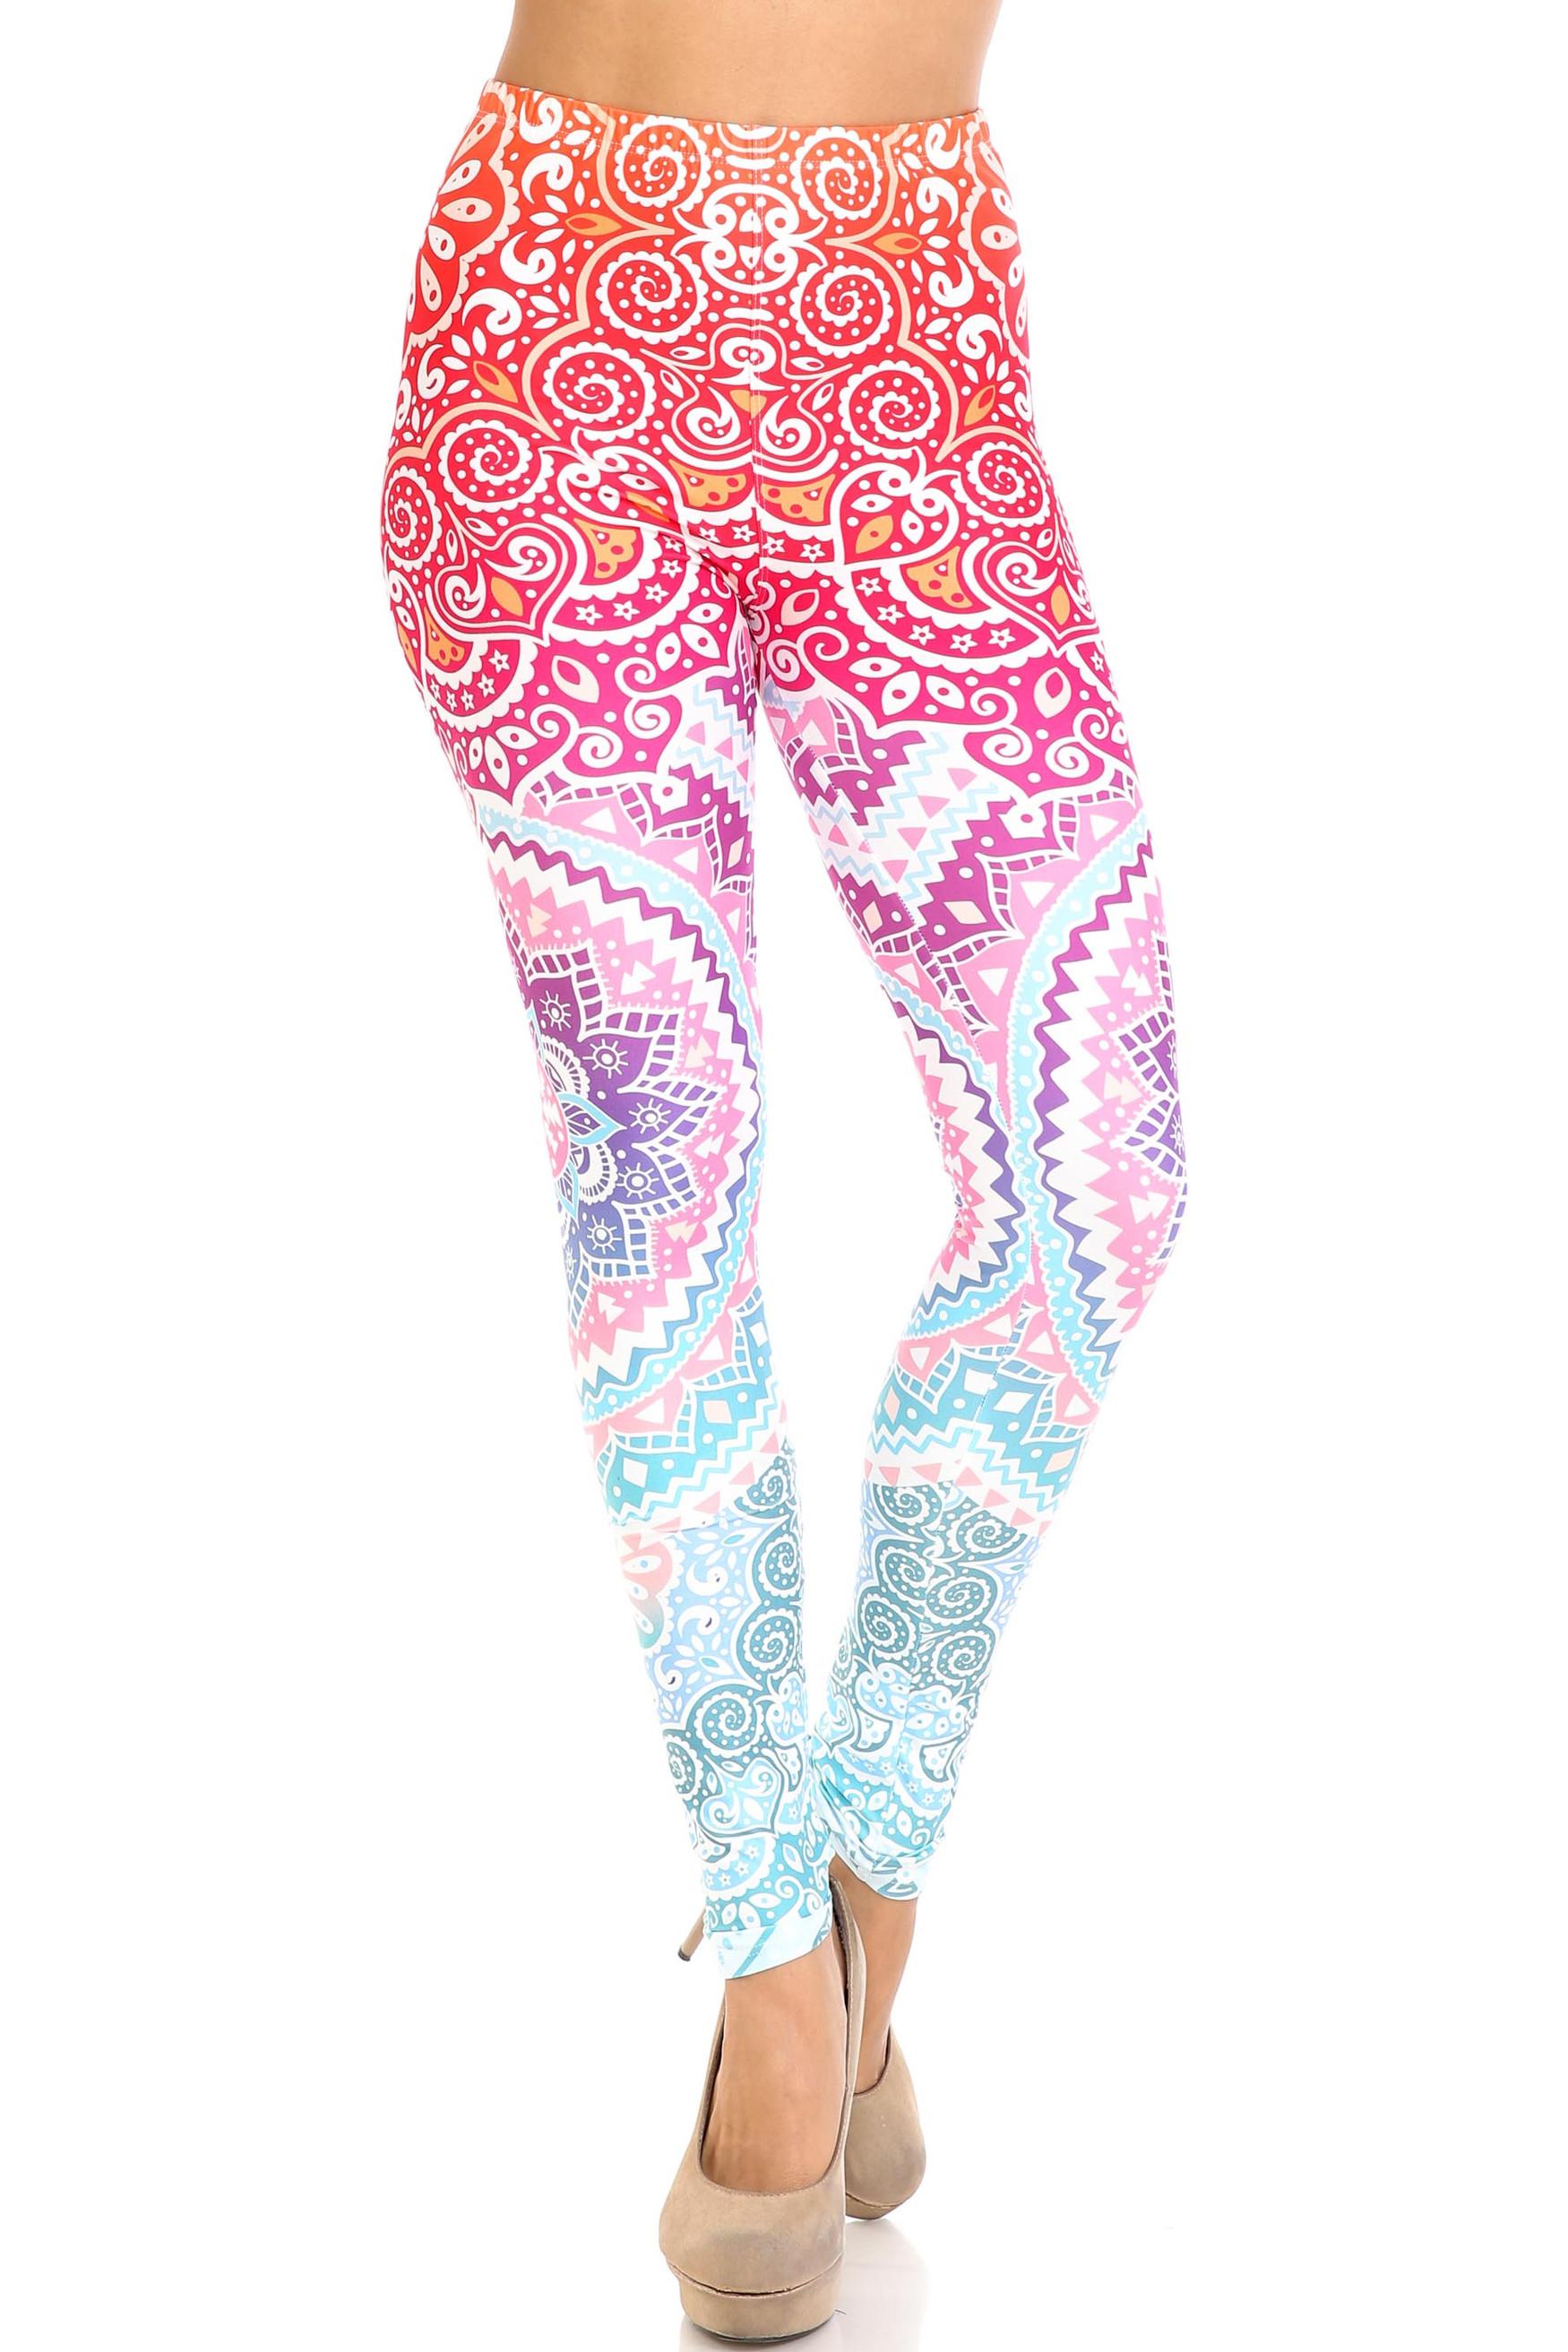 Creamy Soft Ombre Mandala Aztec Leggings - USA Fashion™